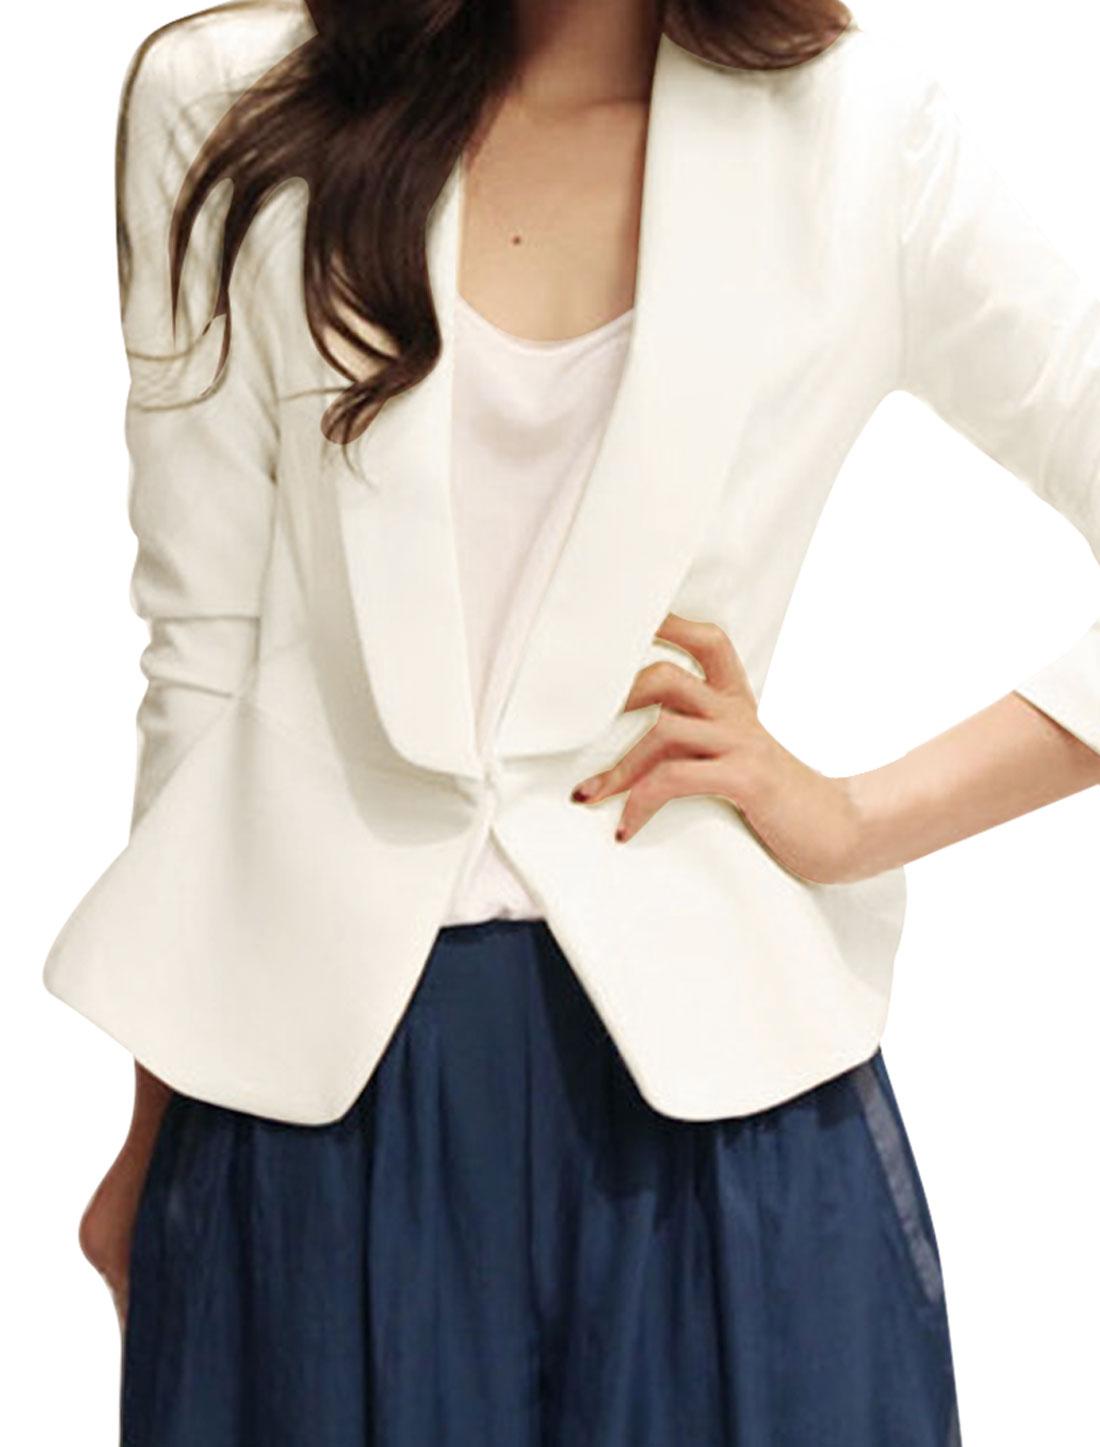 Women's Shawl Lapel Pure Long Sleeves Buttonless Stylish White S Blazer Jacket